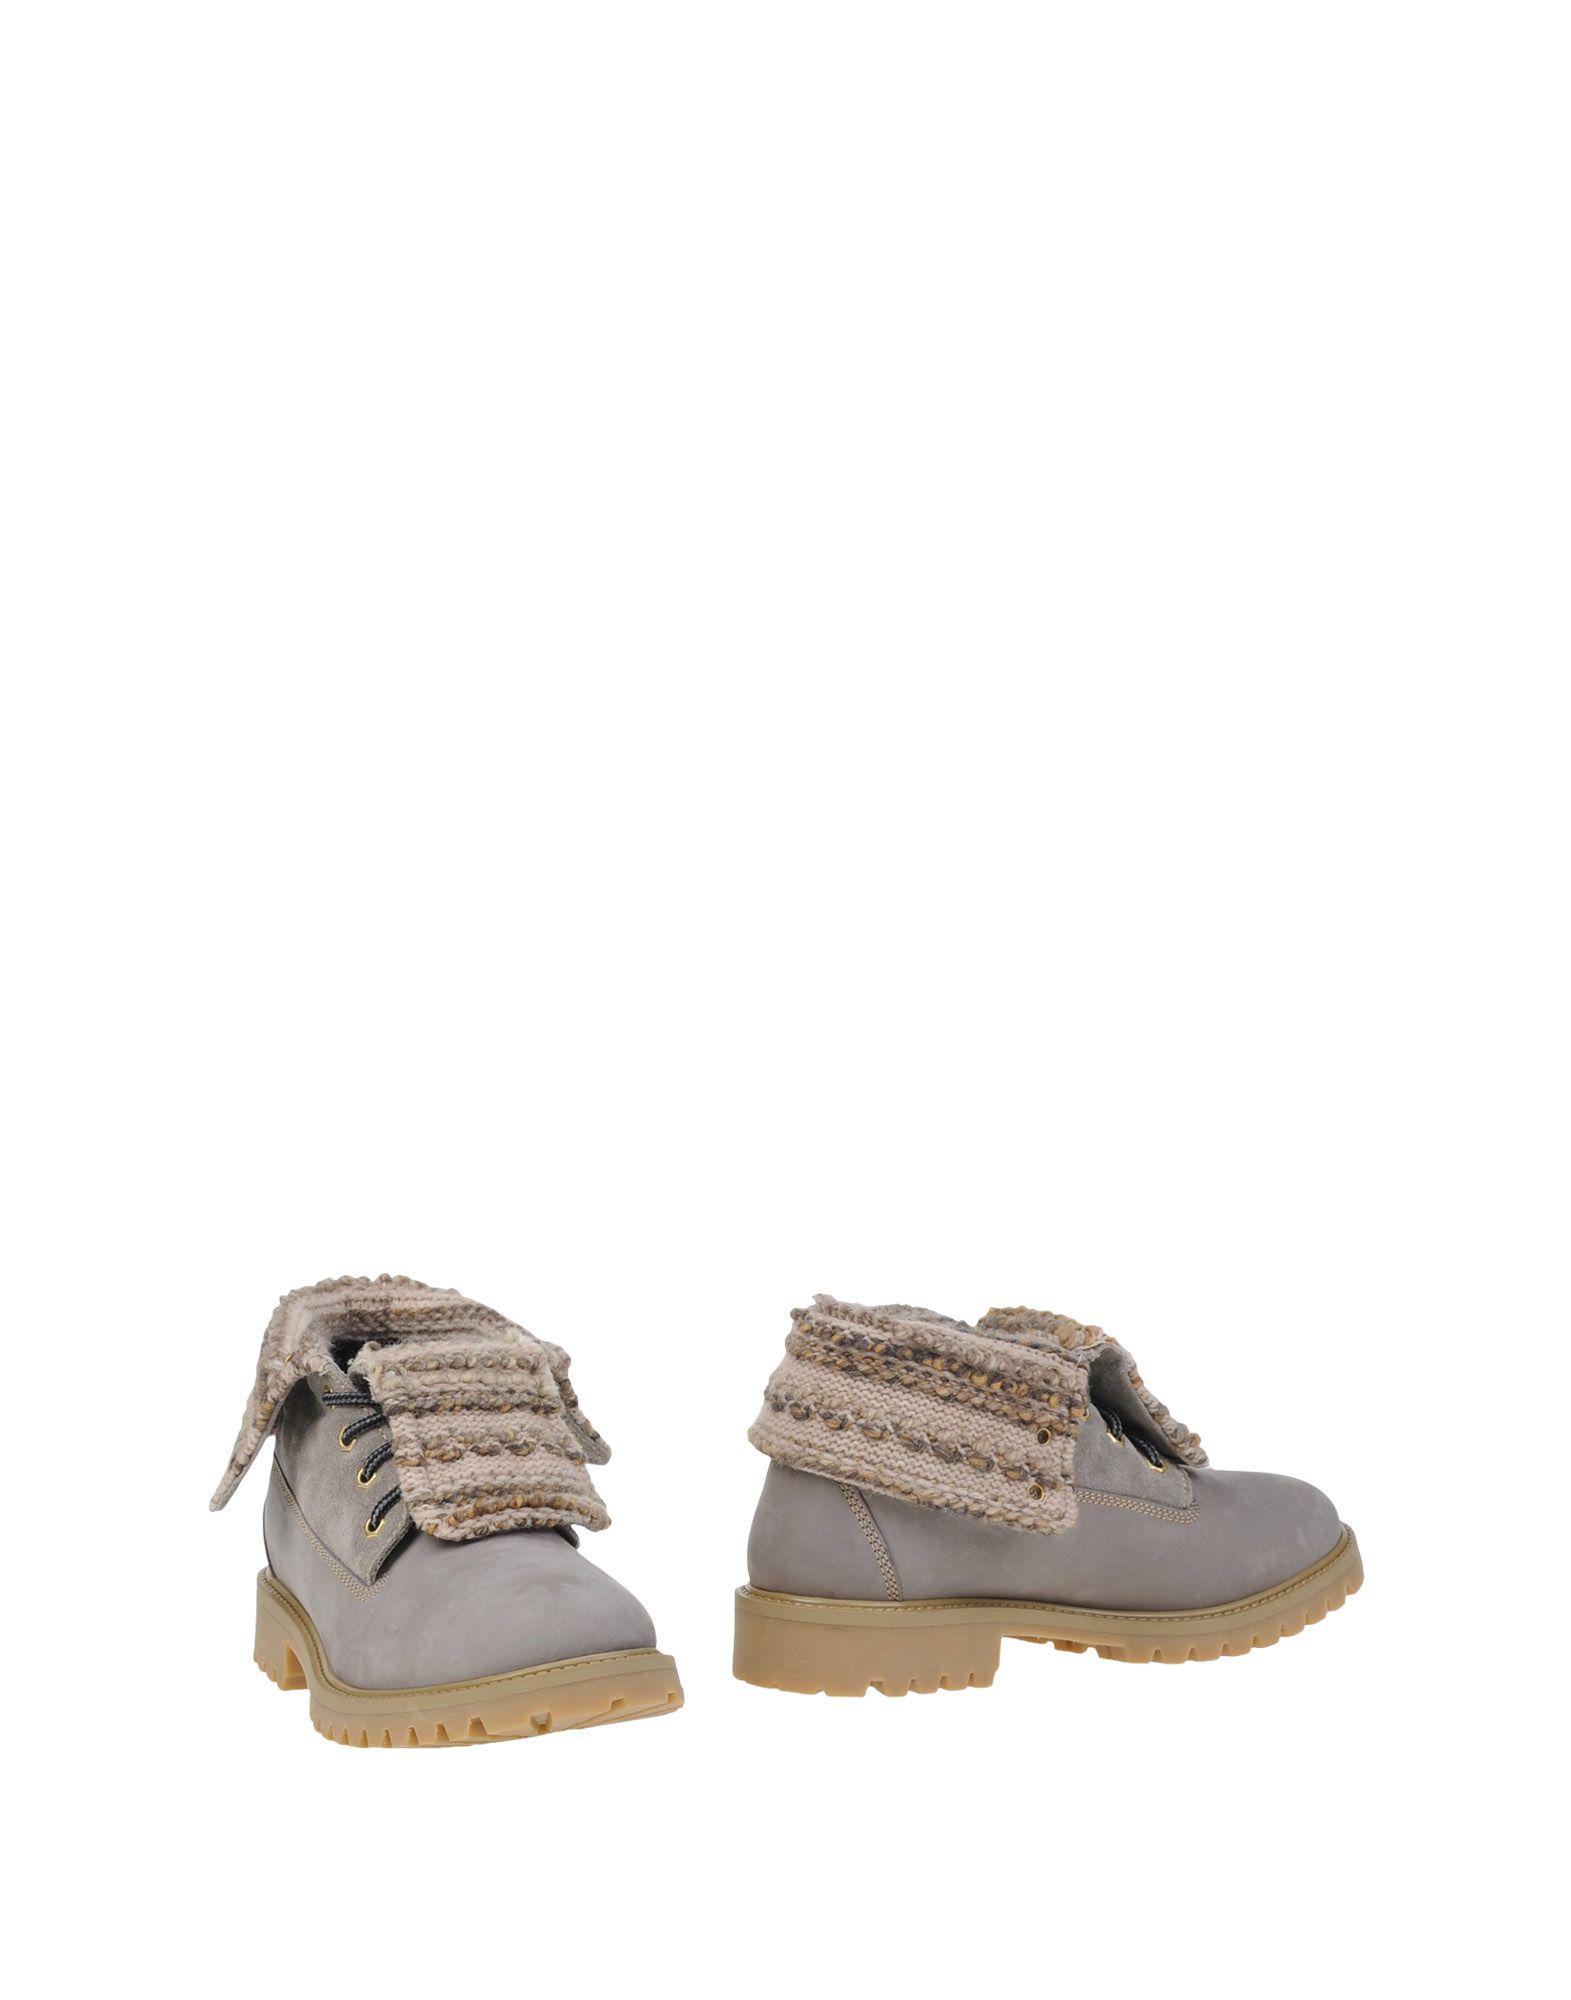 Bottine Grünland Femme - Bottines Grünland Gris Chaussures femme pas cher homme et femme